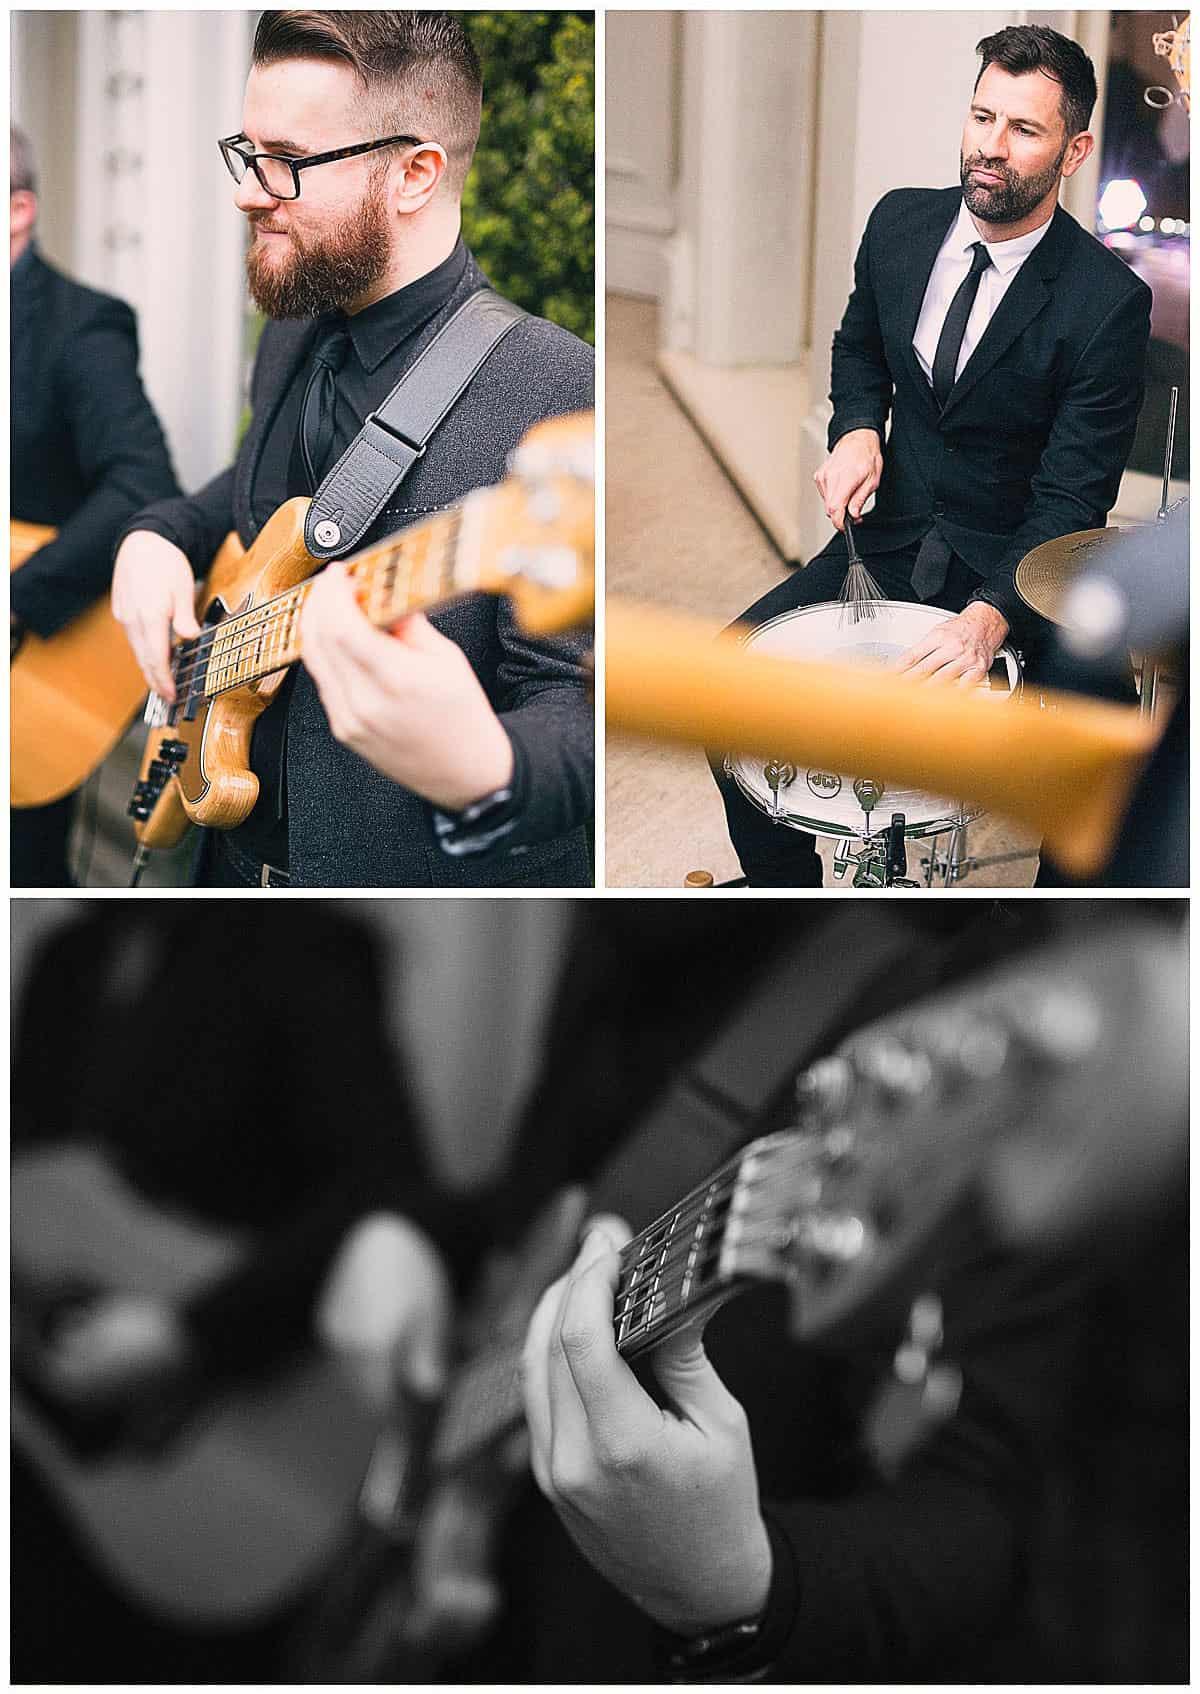 Hacking Creative Wedding Photography - The Baker Boys Wedding Band